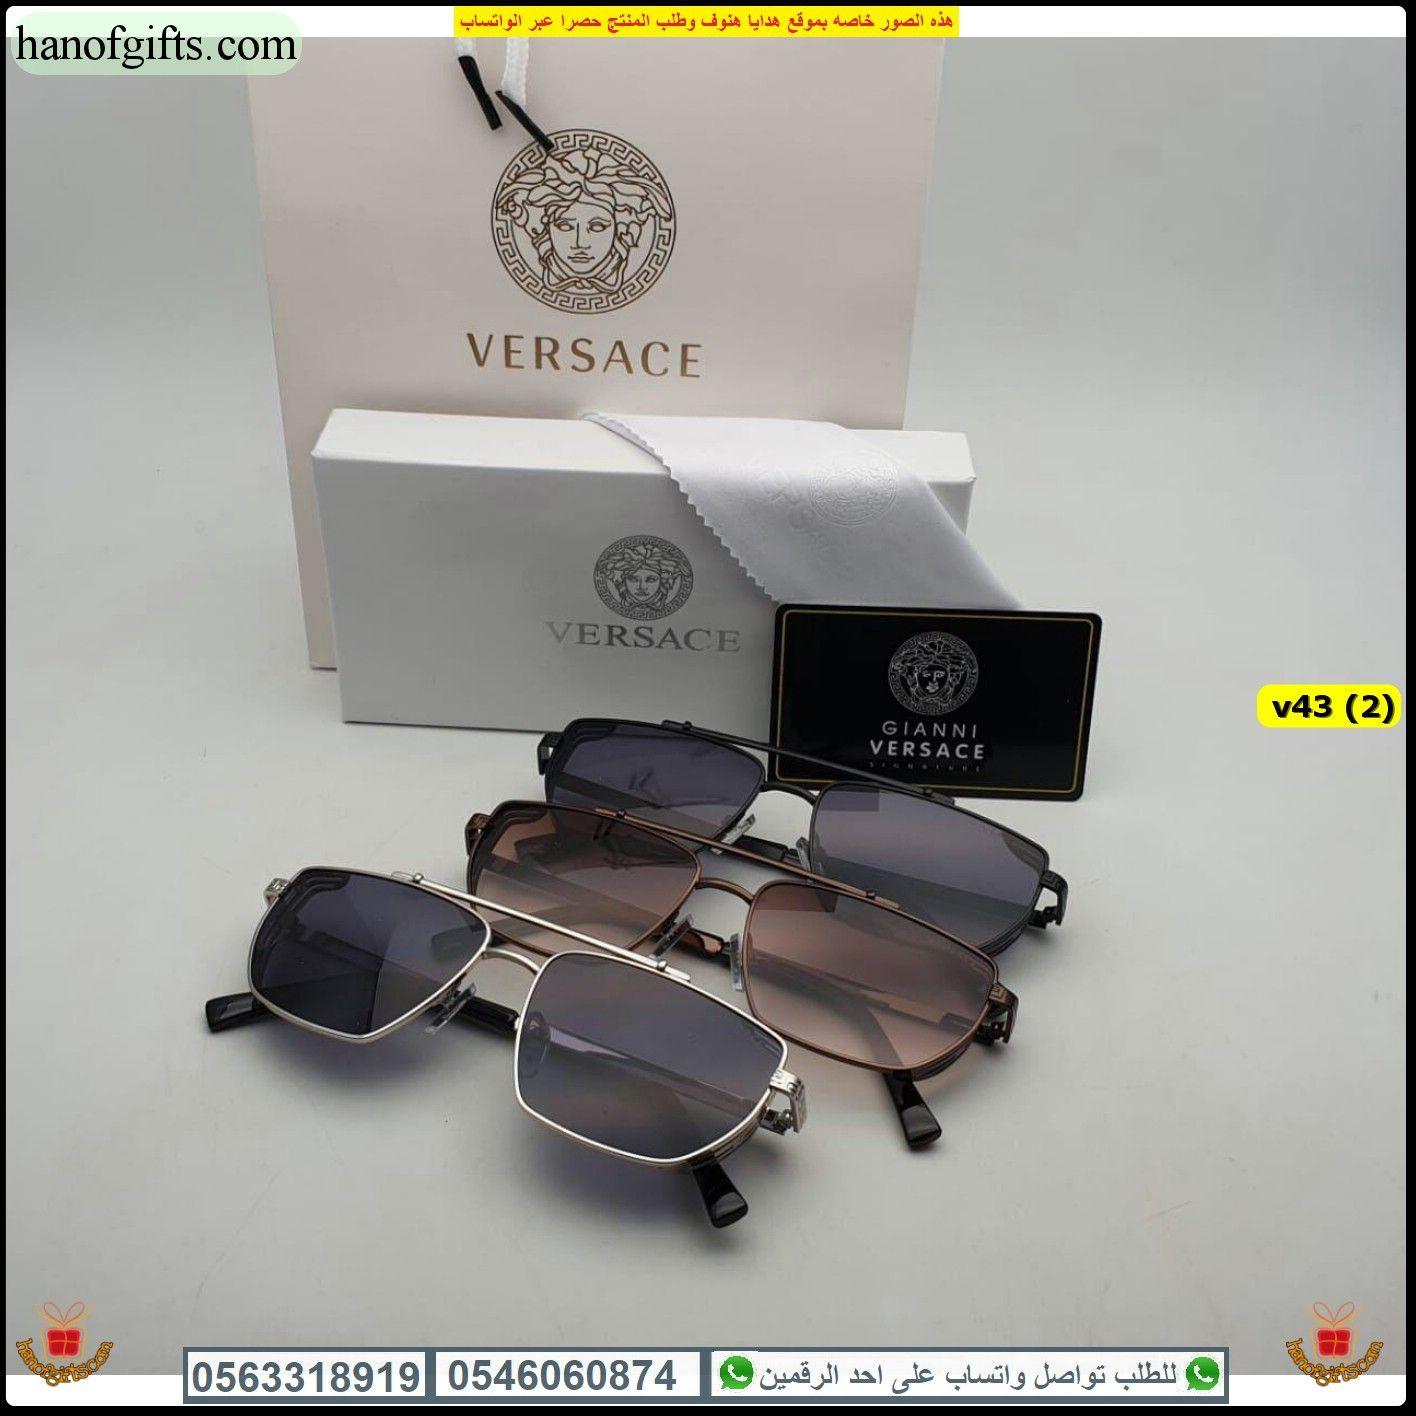 نظارات فرزاتشي 2020 رجالي مع ملحقاتها الفخمه كيس و علبة الماركه هدايا هنوف Oval Sunglass Sunglasses Glasses